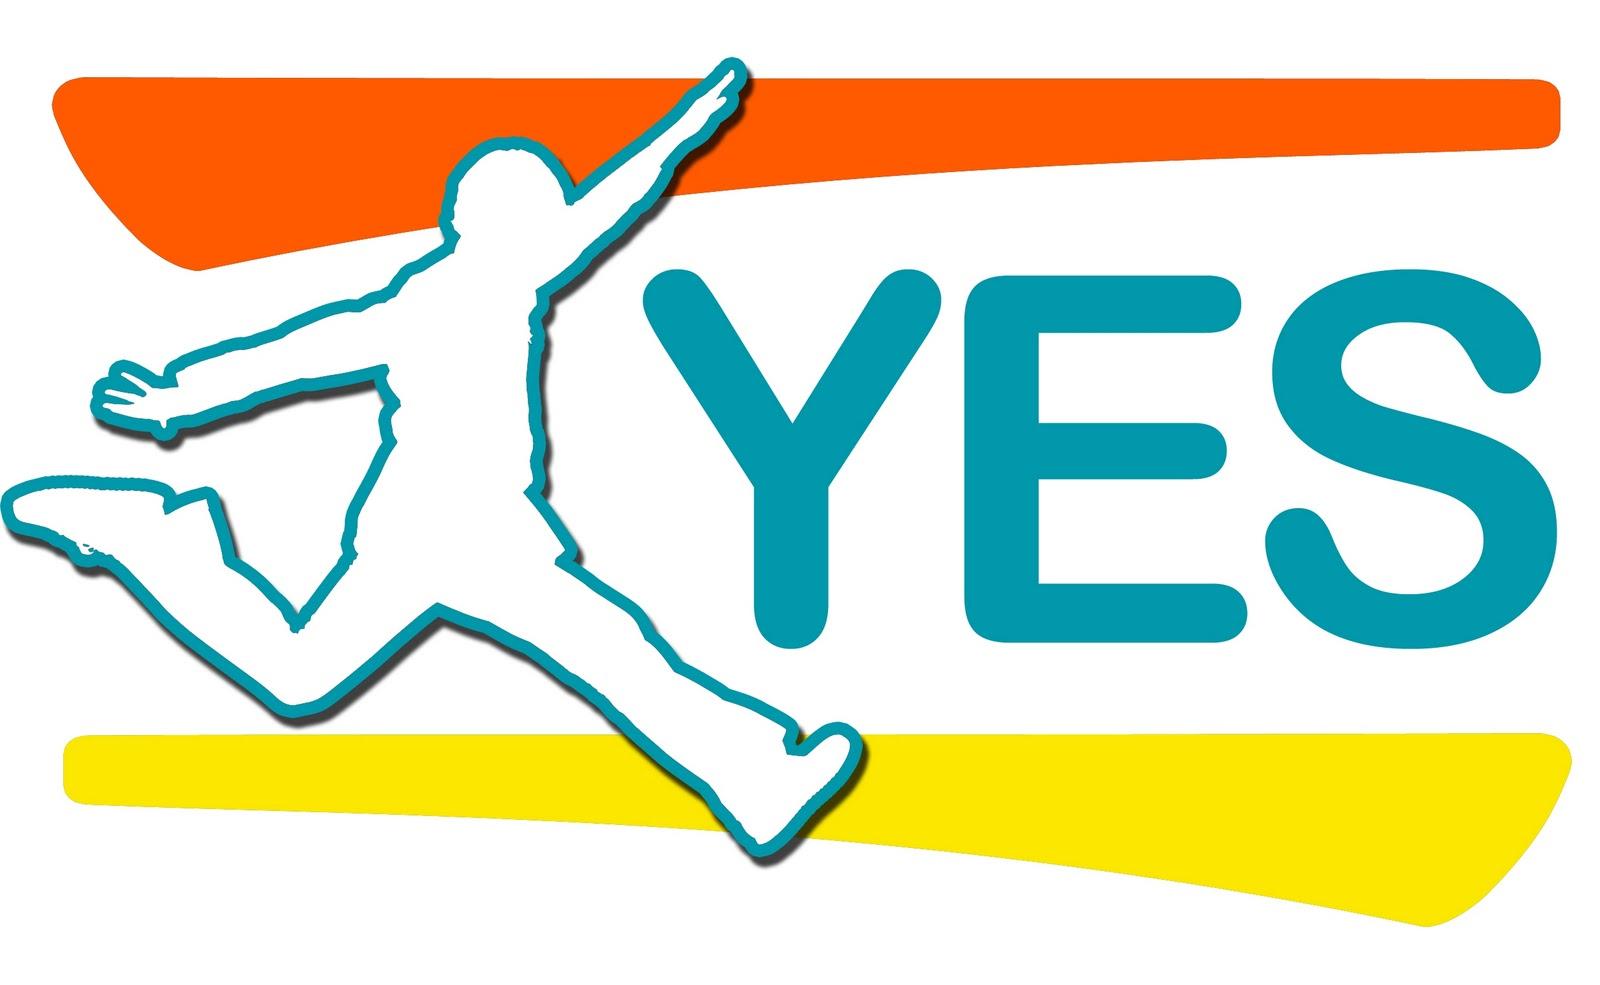 http://3.bp.blogspot.com/_VfvGRpQoTIo/TRBAaA-bLEI/AAAAAAAAAxY/F1HtOl1PJtM/s1600/Yes-logo-final.JPG